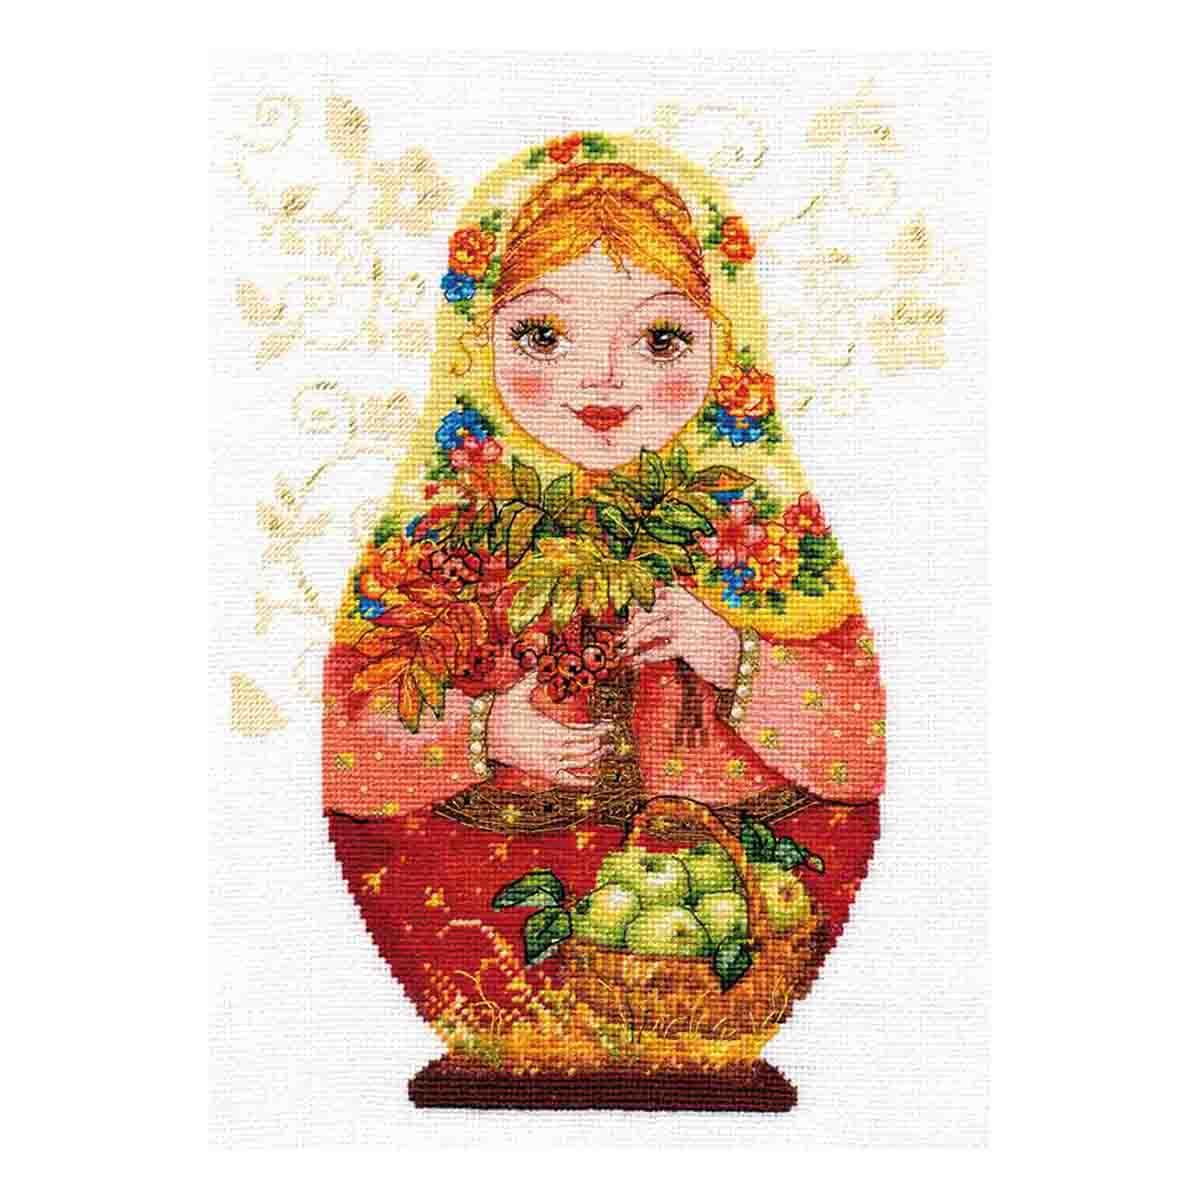 6-06 Набор для вышивания АЛИСА 'Матрешки. Осенняя краса' 19*26см